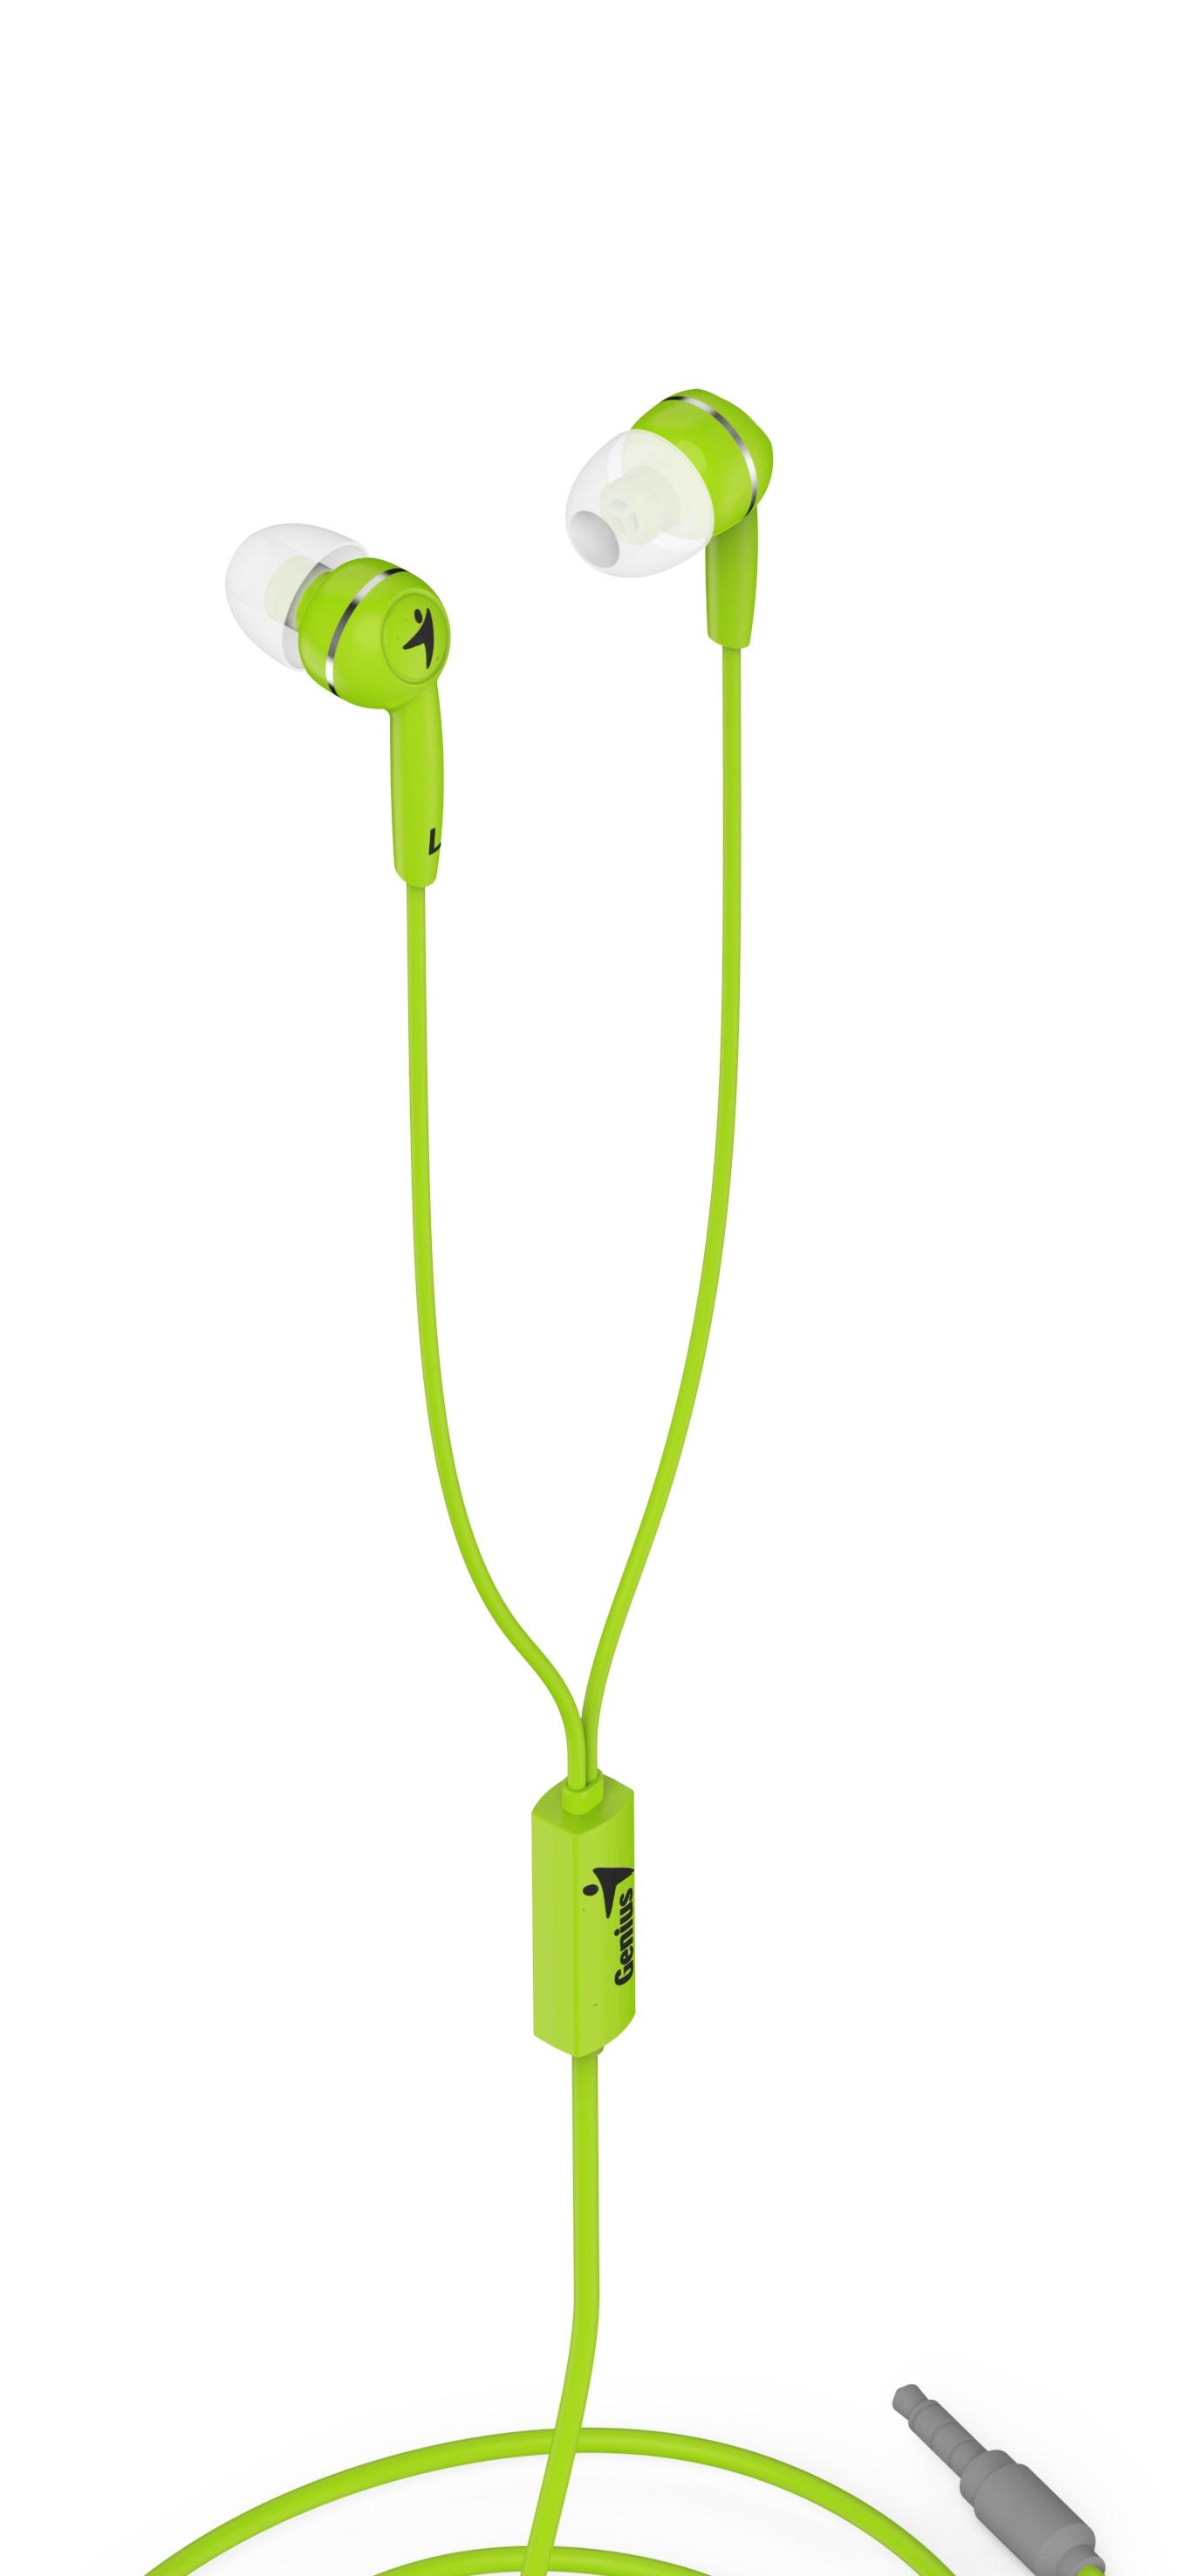 Sluchátka Genius HS-M320 mobile headset, green - 31710005416